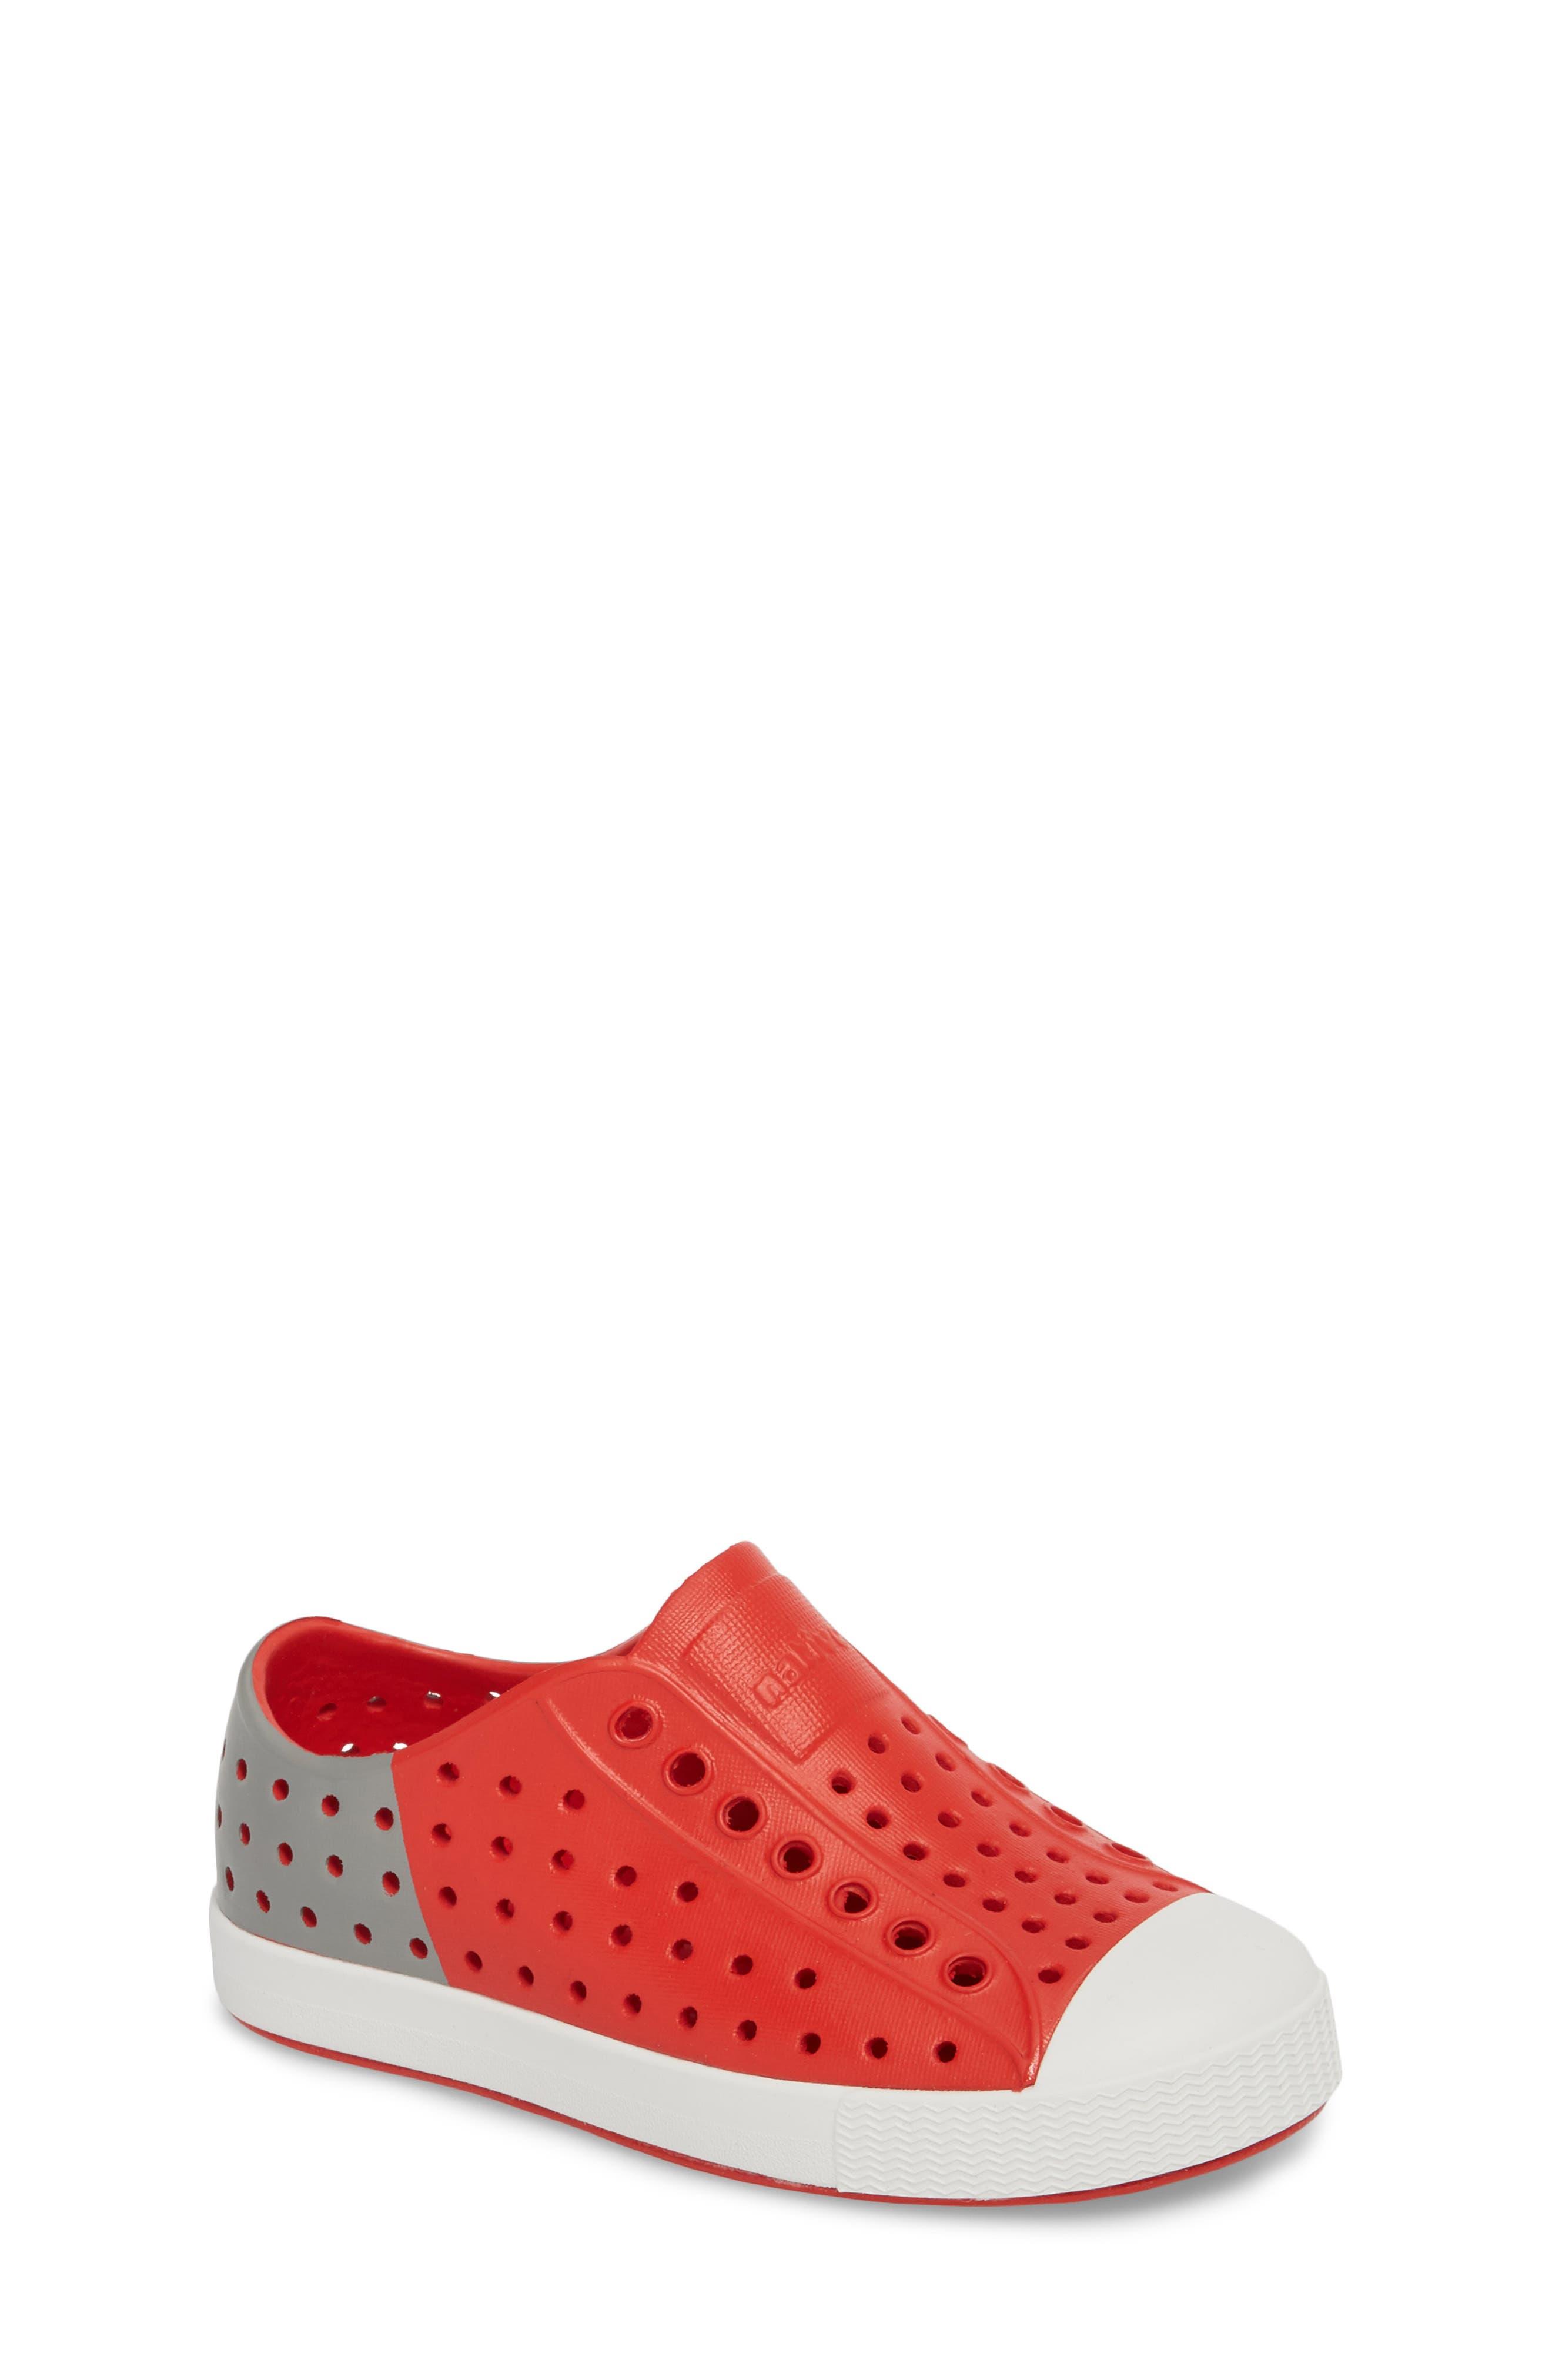 'Jefferson' Water Friendly Slip-On Sneaker,                             Main thumbnail 1, color,                             025